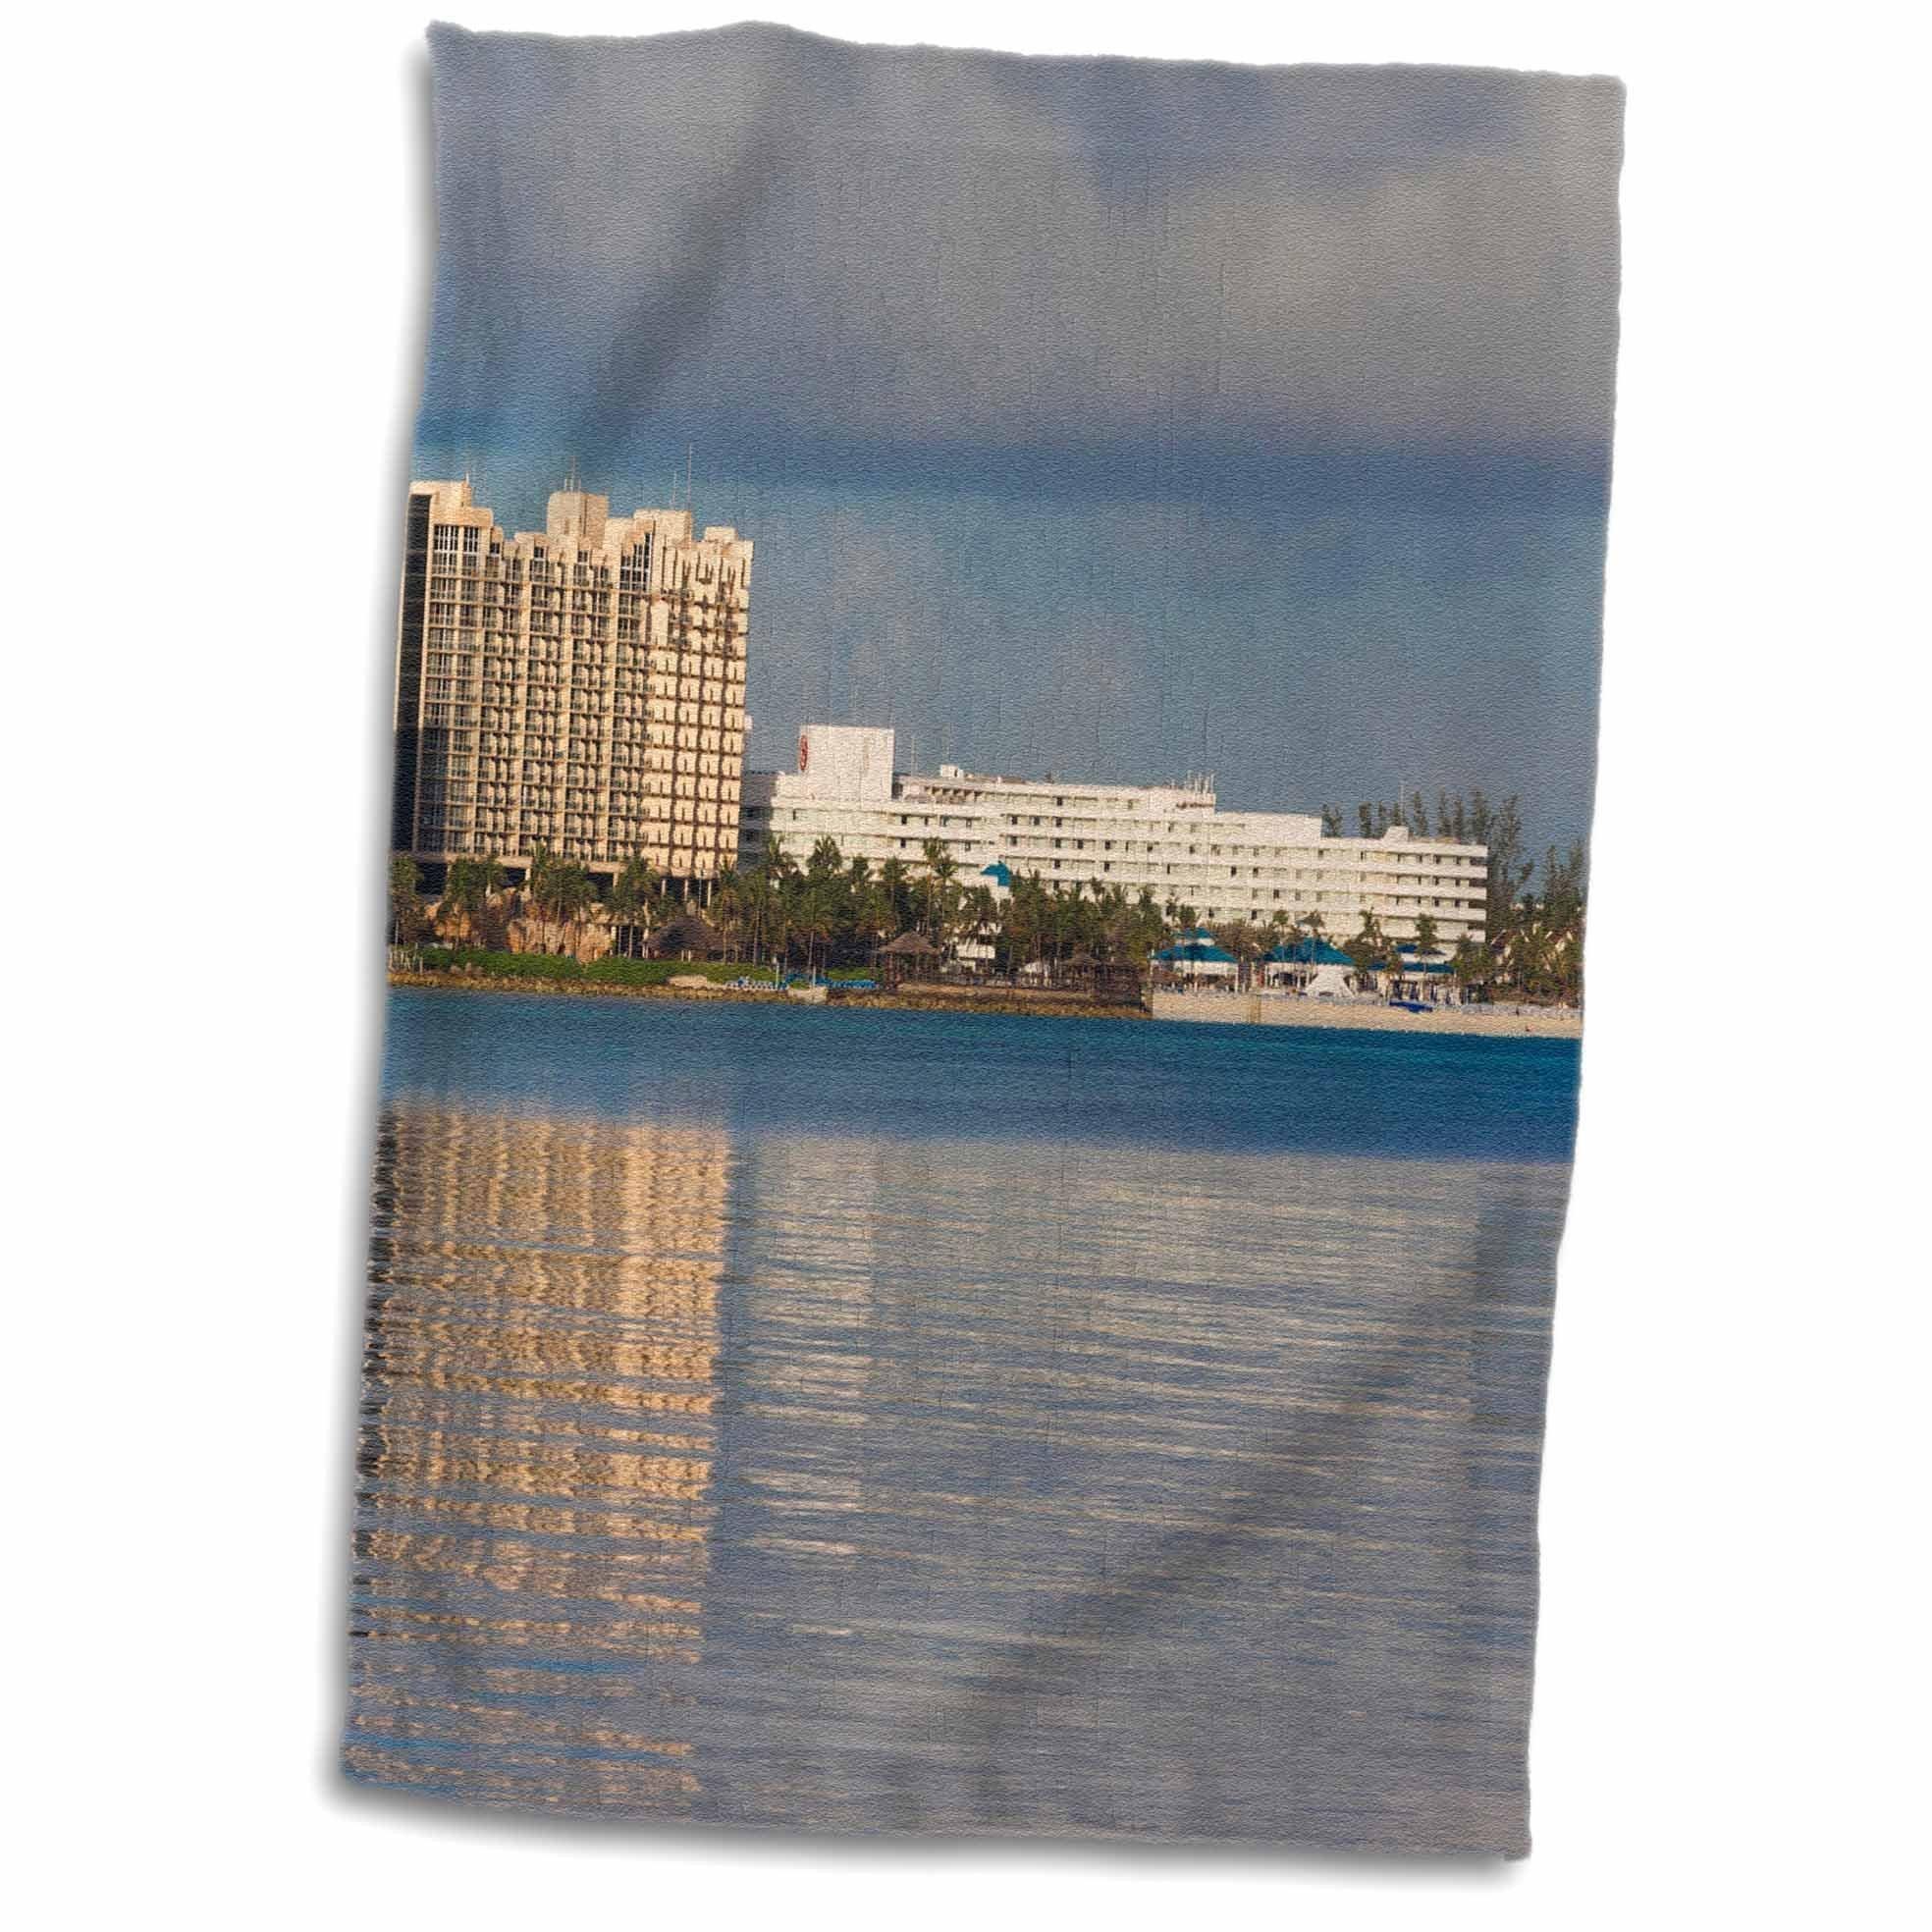 3D Rose Bahamas - New Providence - Nassau - Resort Hotels - Ca05 Wbi0439 - Walter Bibikow Towel, 15'' x 22''